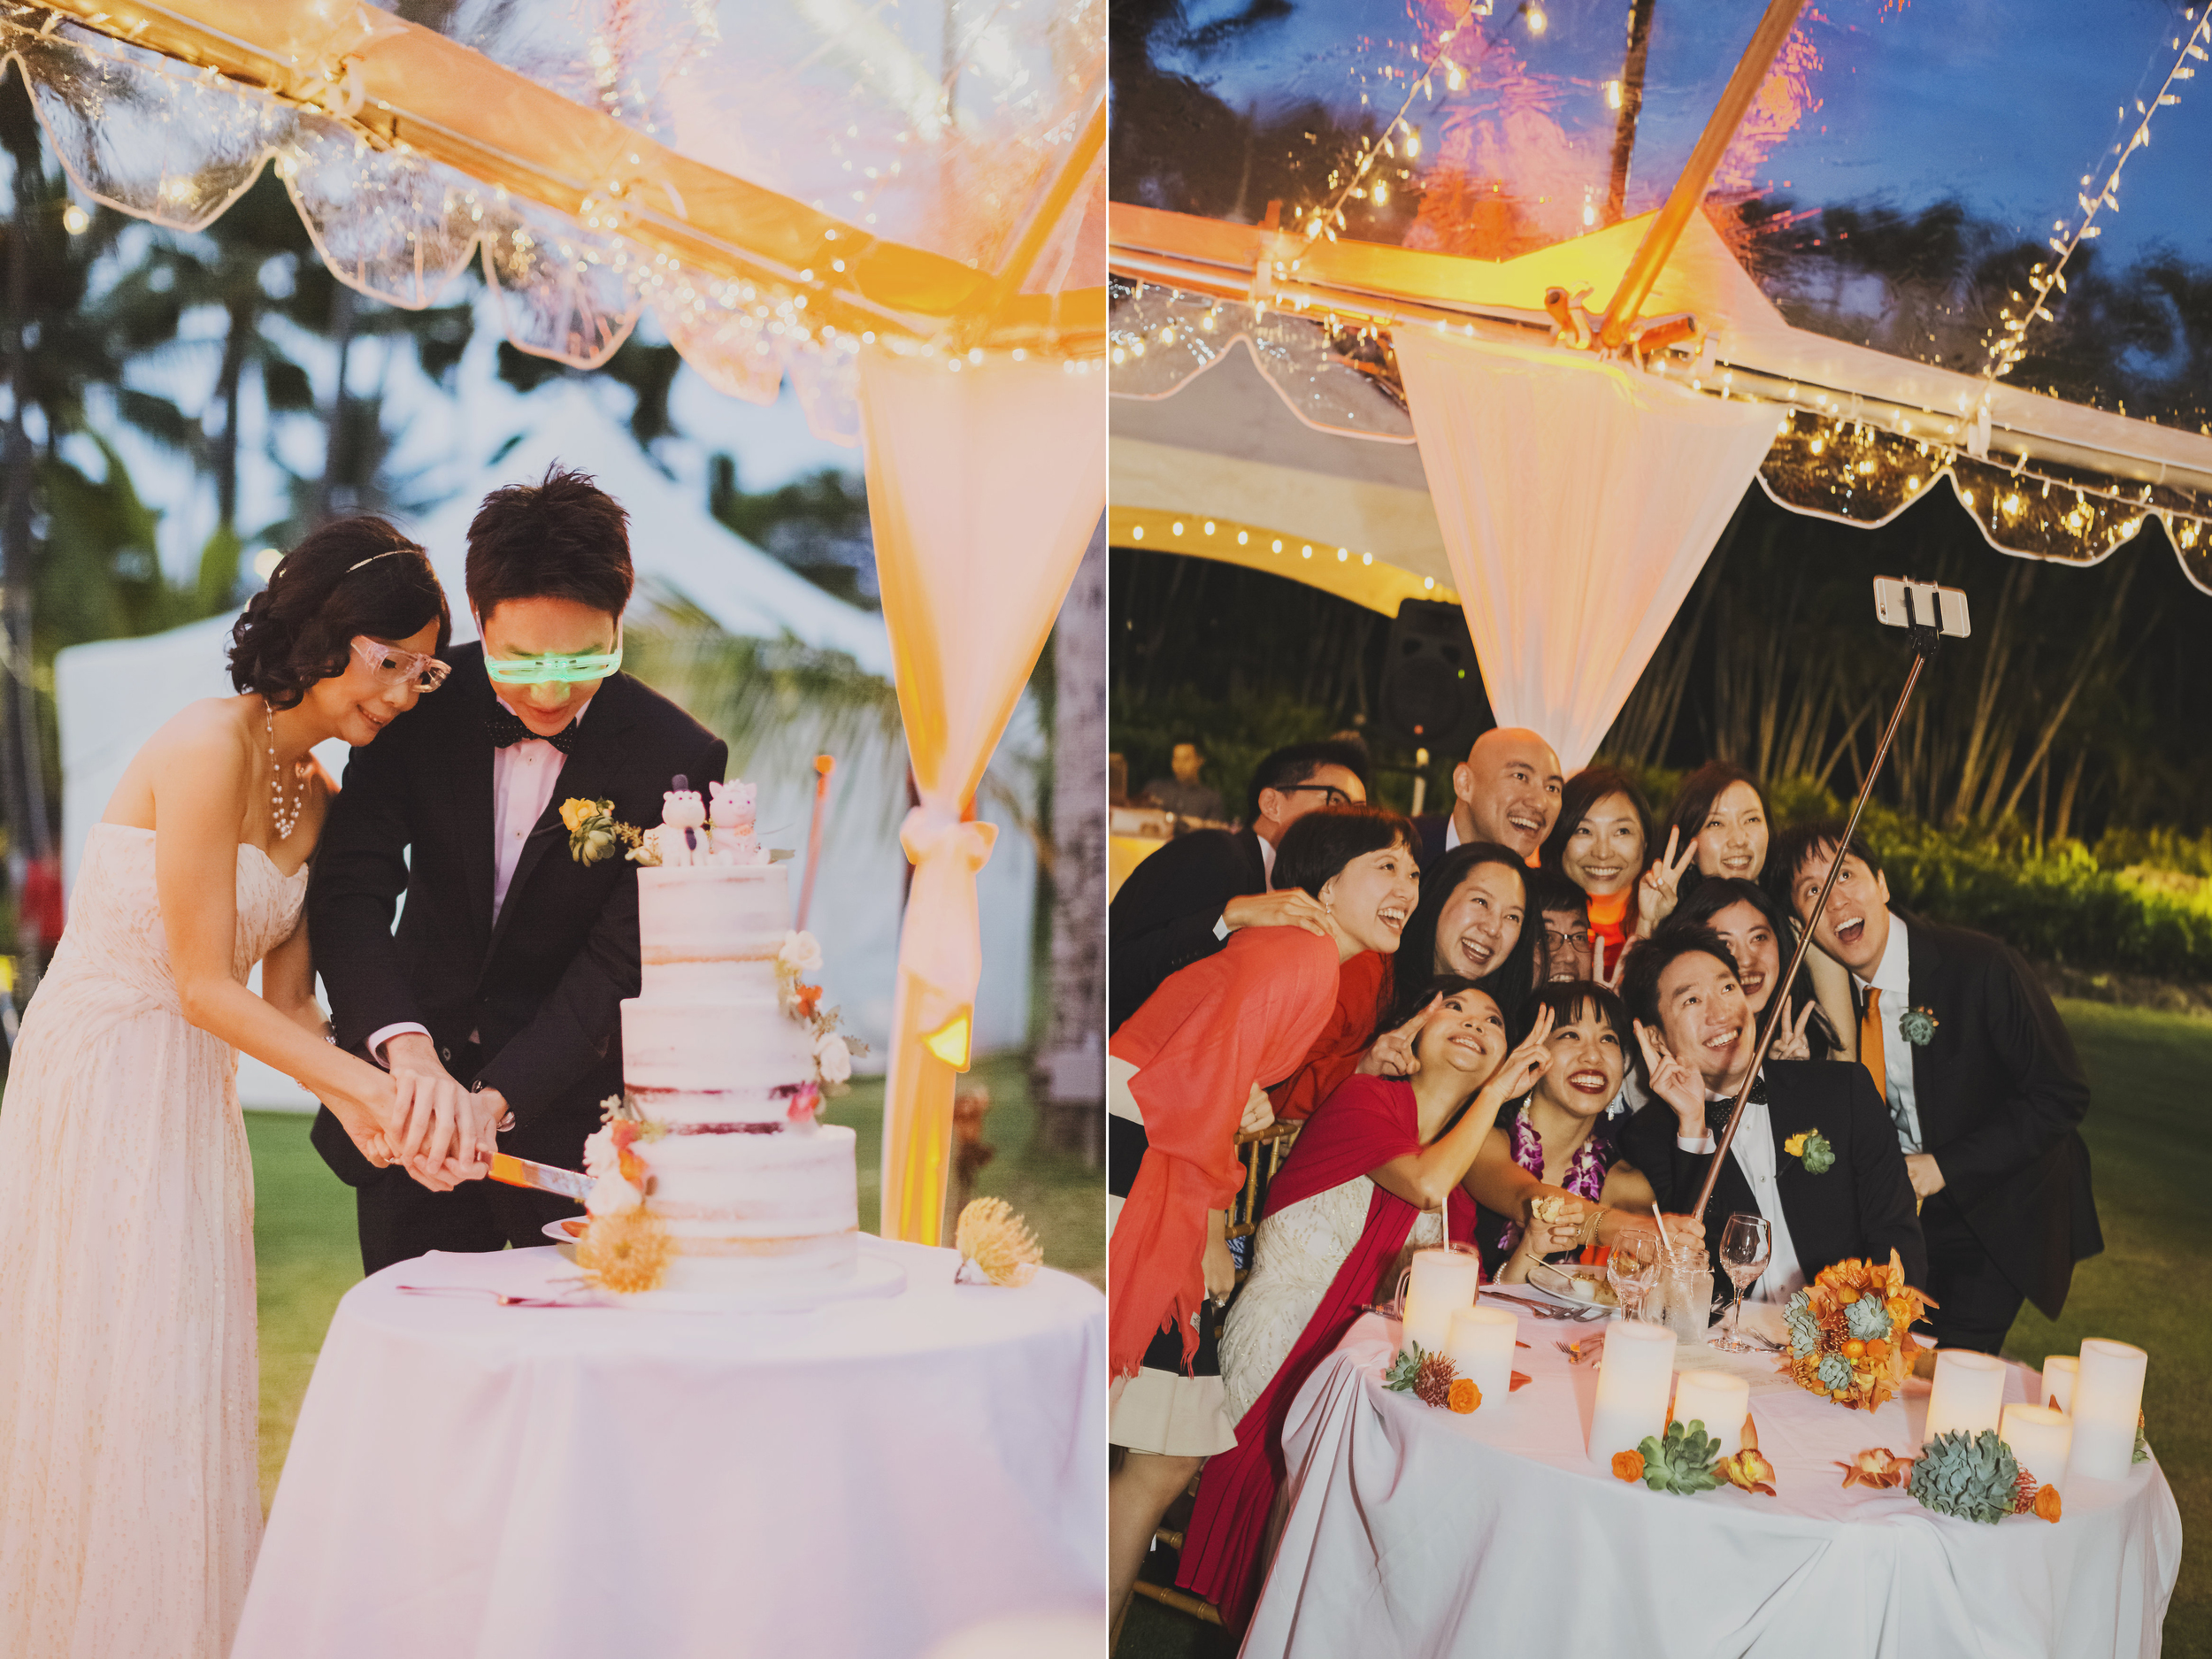 angie-diaz-photography-oahu-wedding-lanikuhonoa-shenshen-marshall-61.jpg